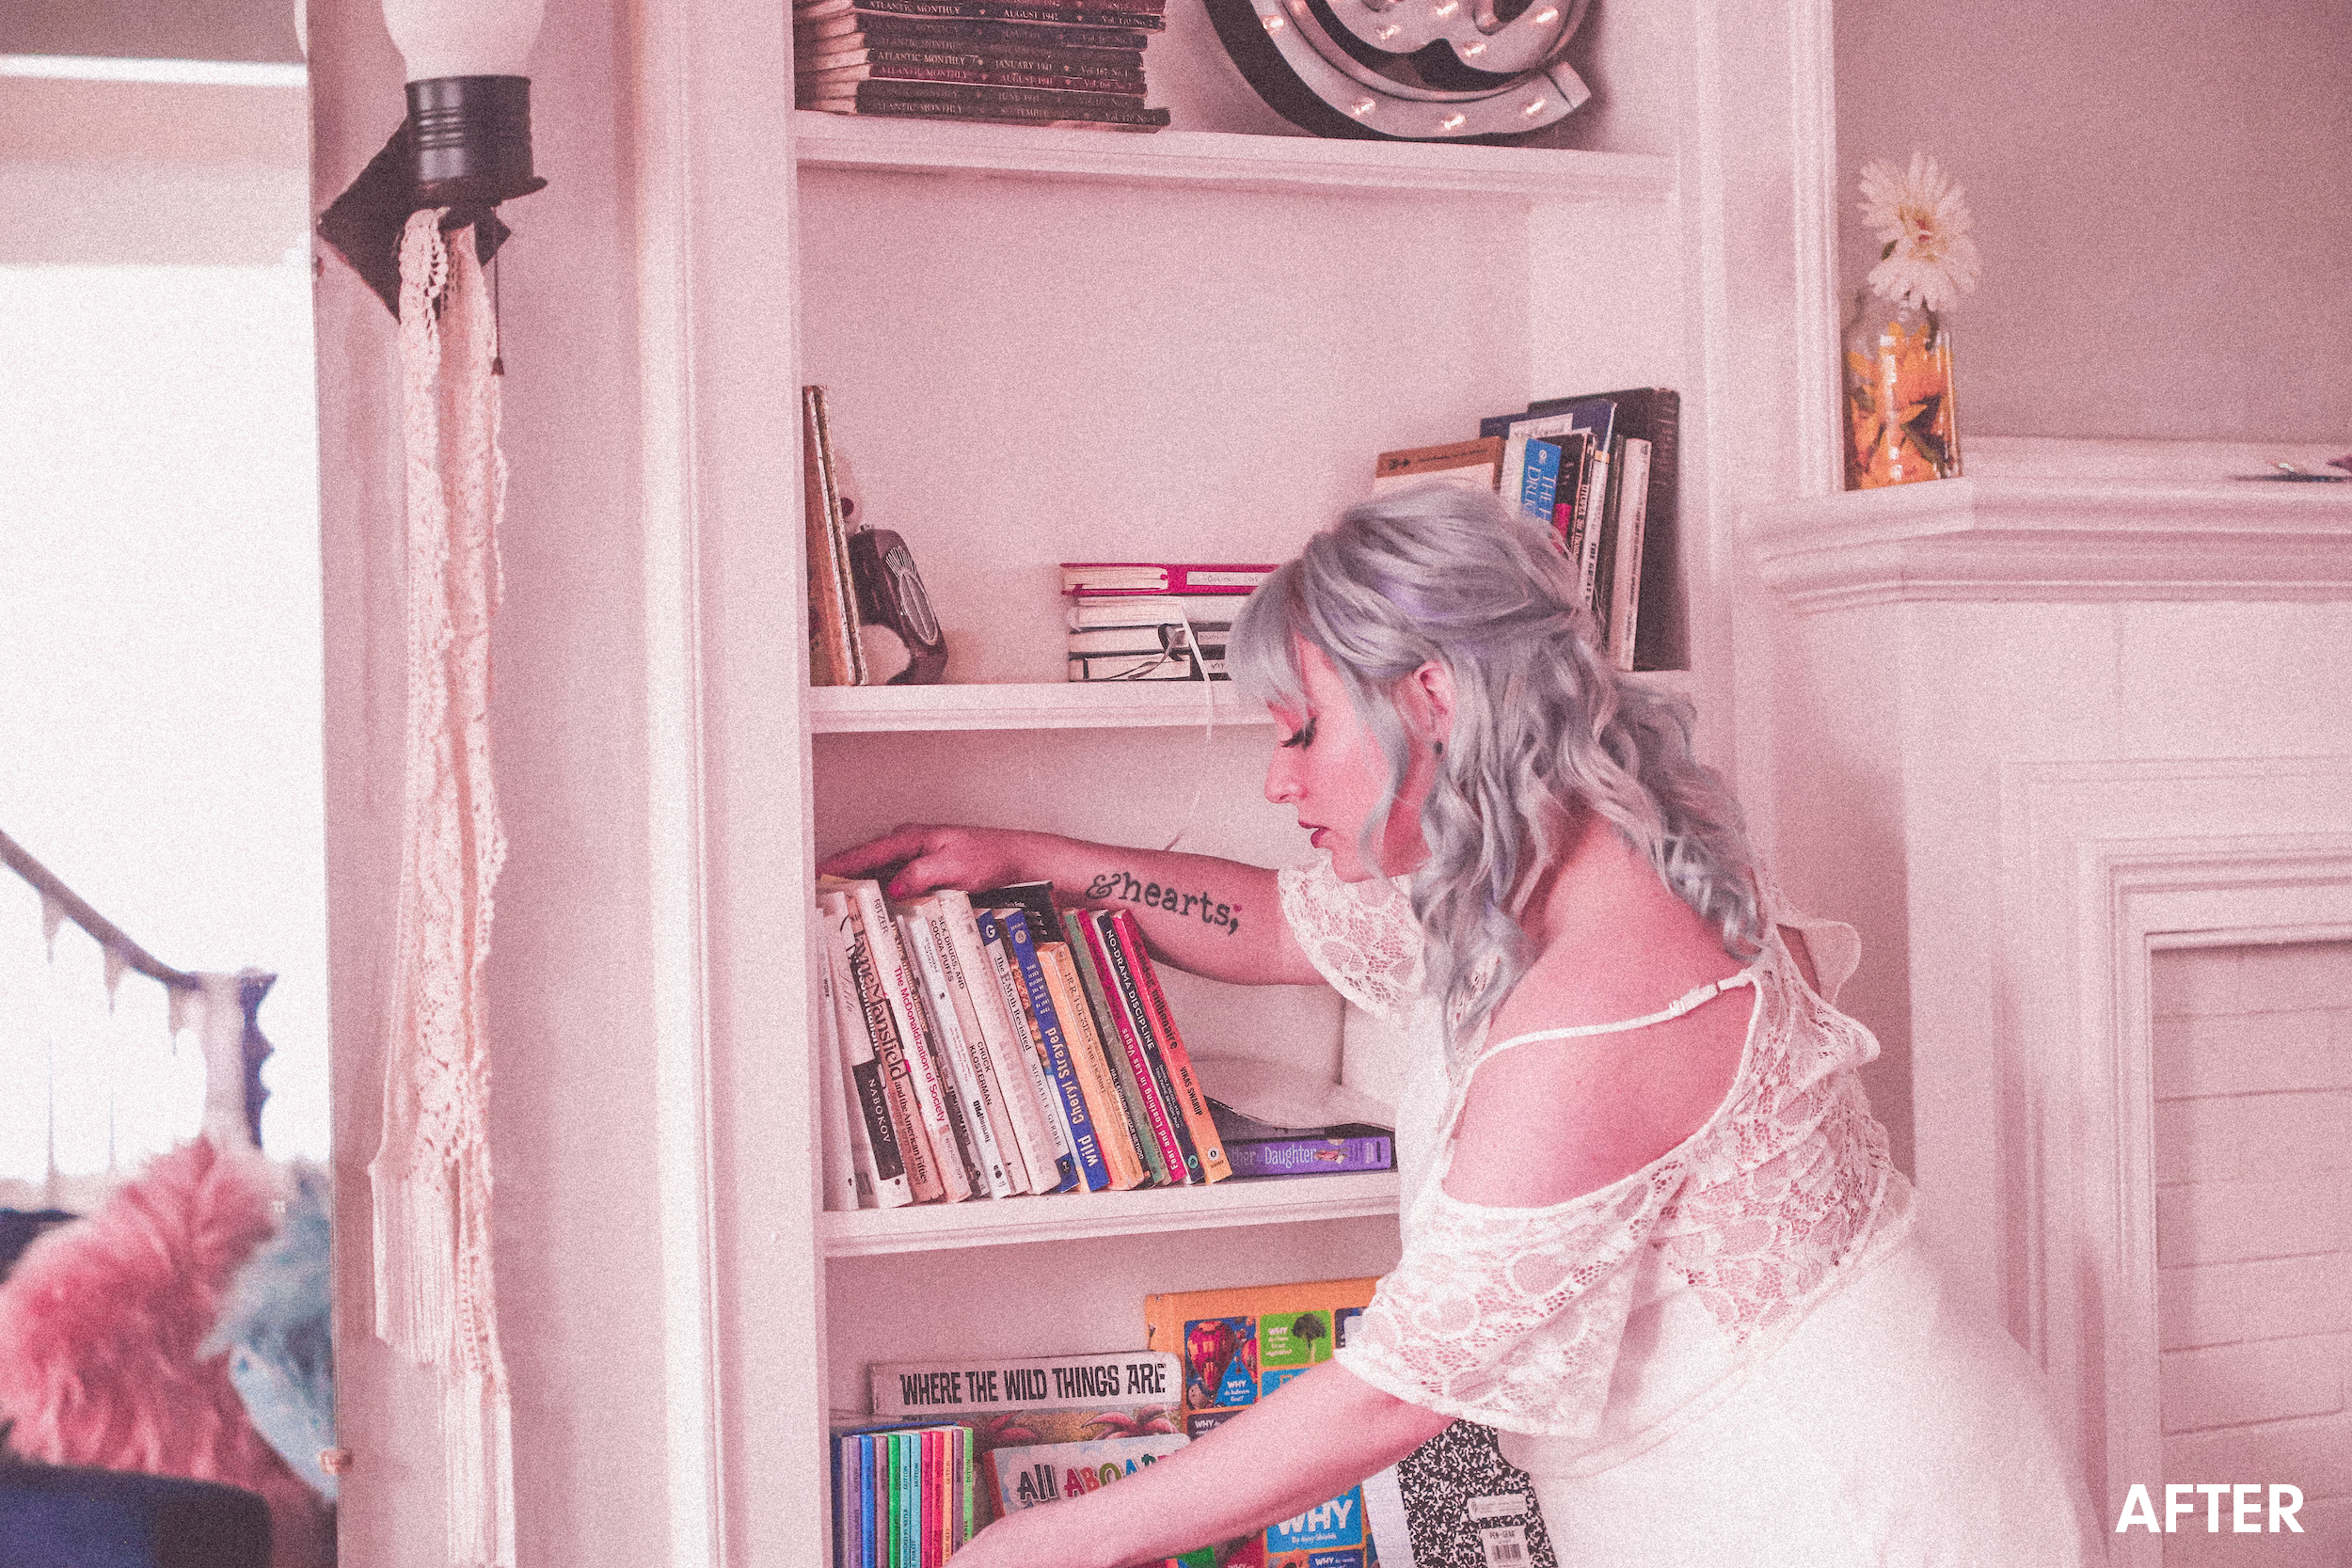 pink-josi-denise-lavender-hair-blogger-bookshelflavender-hair-blogger-bookshelfchickpeach-lightroom-presets1.jpg